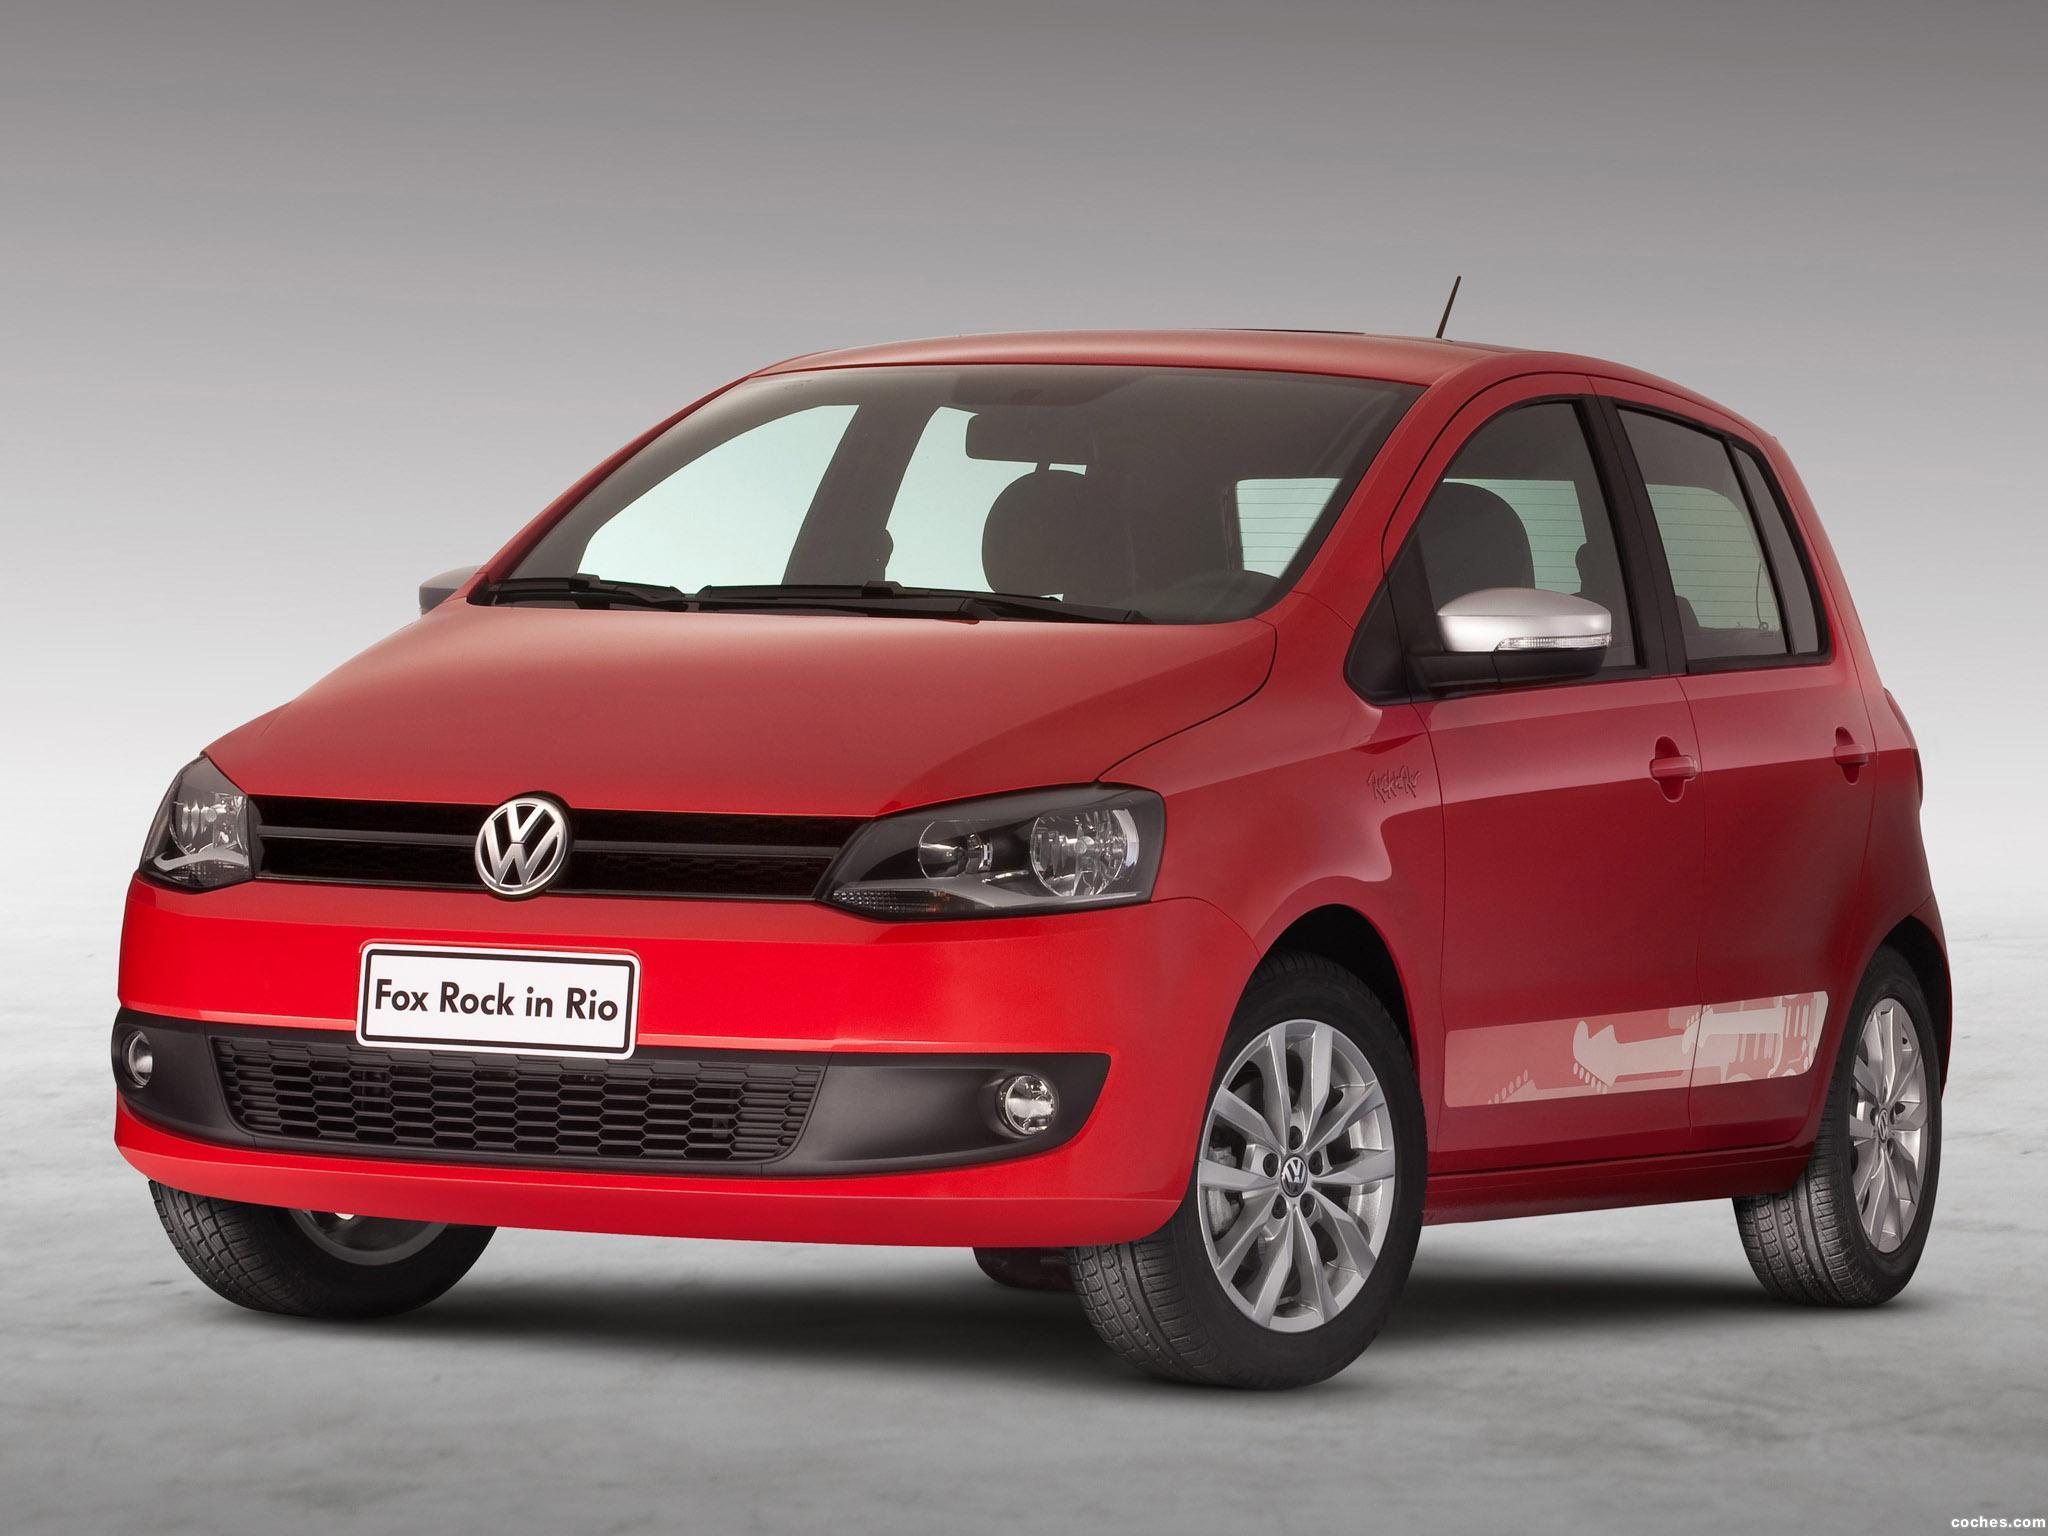 Foto 7 de Volkswagen Fox Rock in Rio 2013